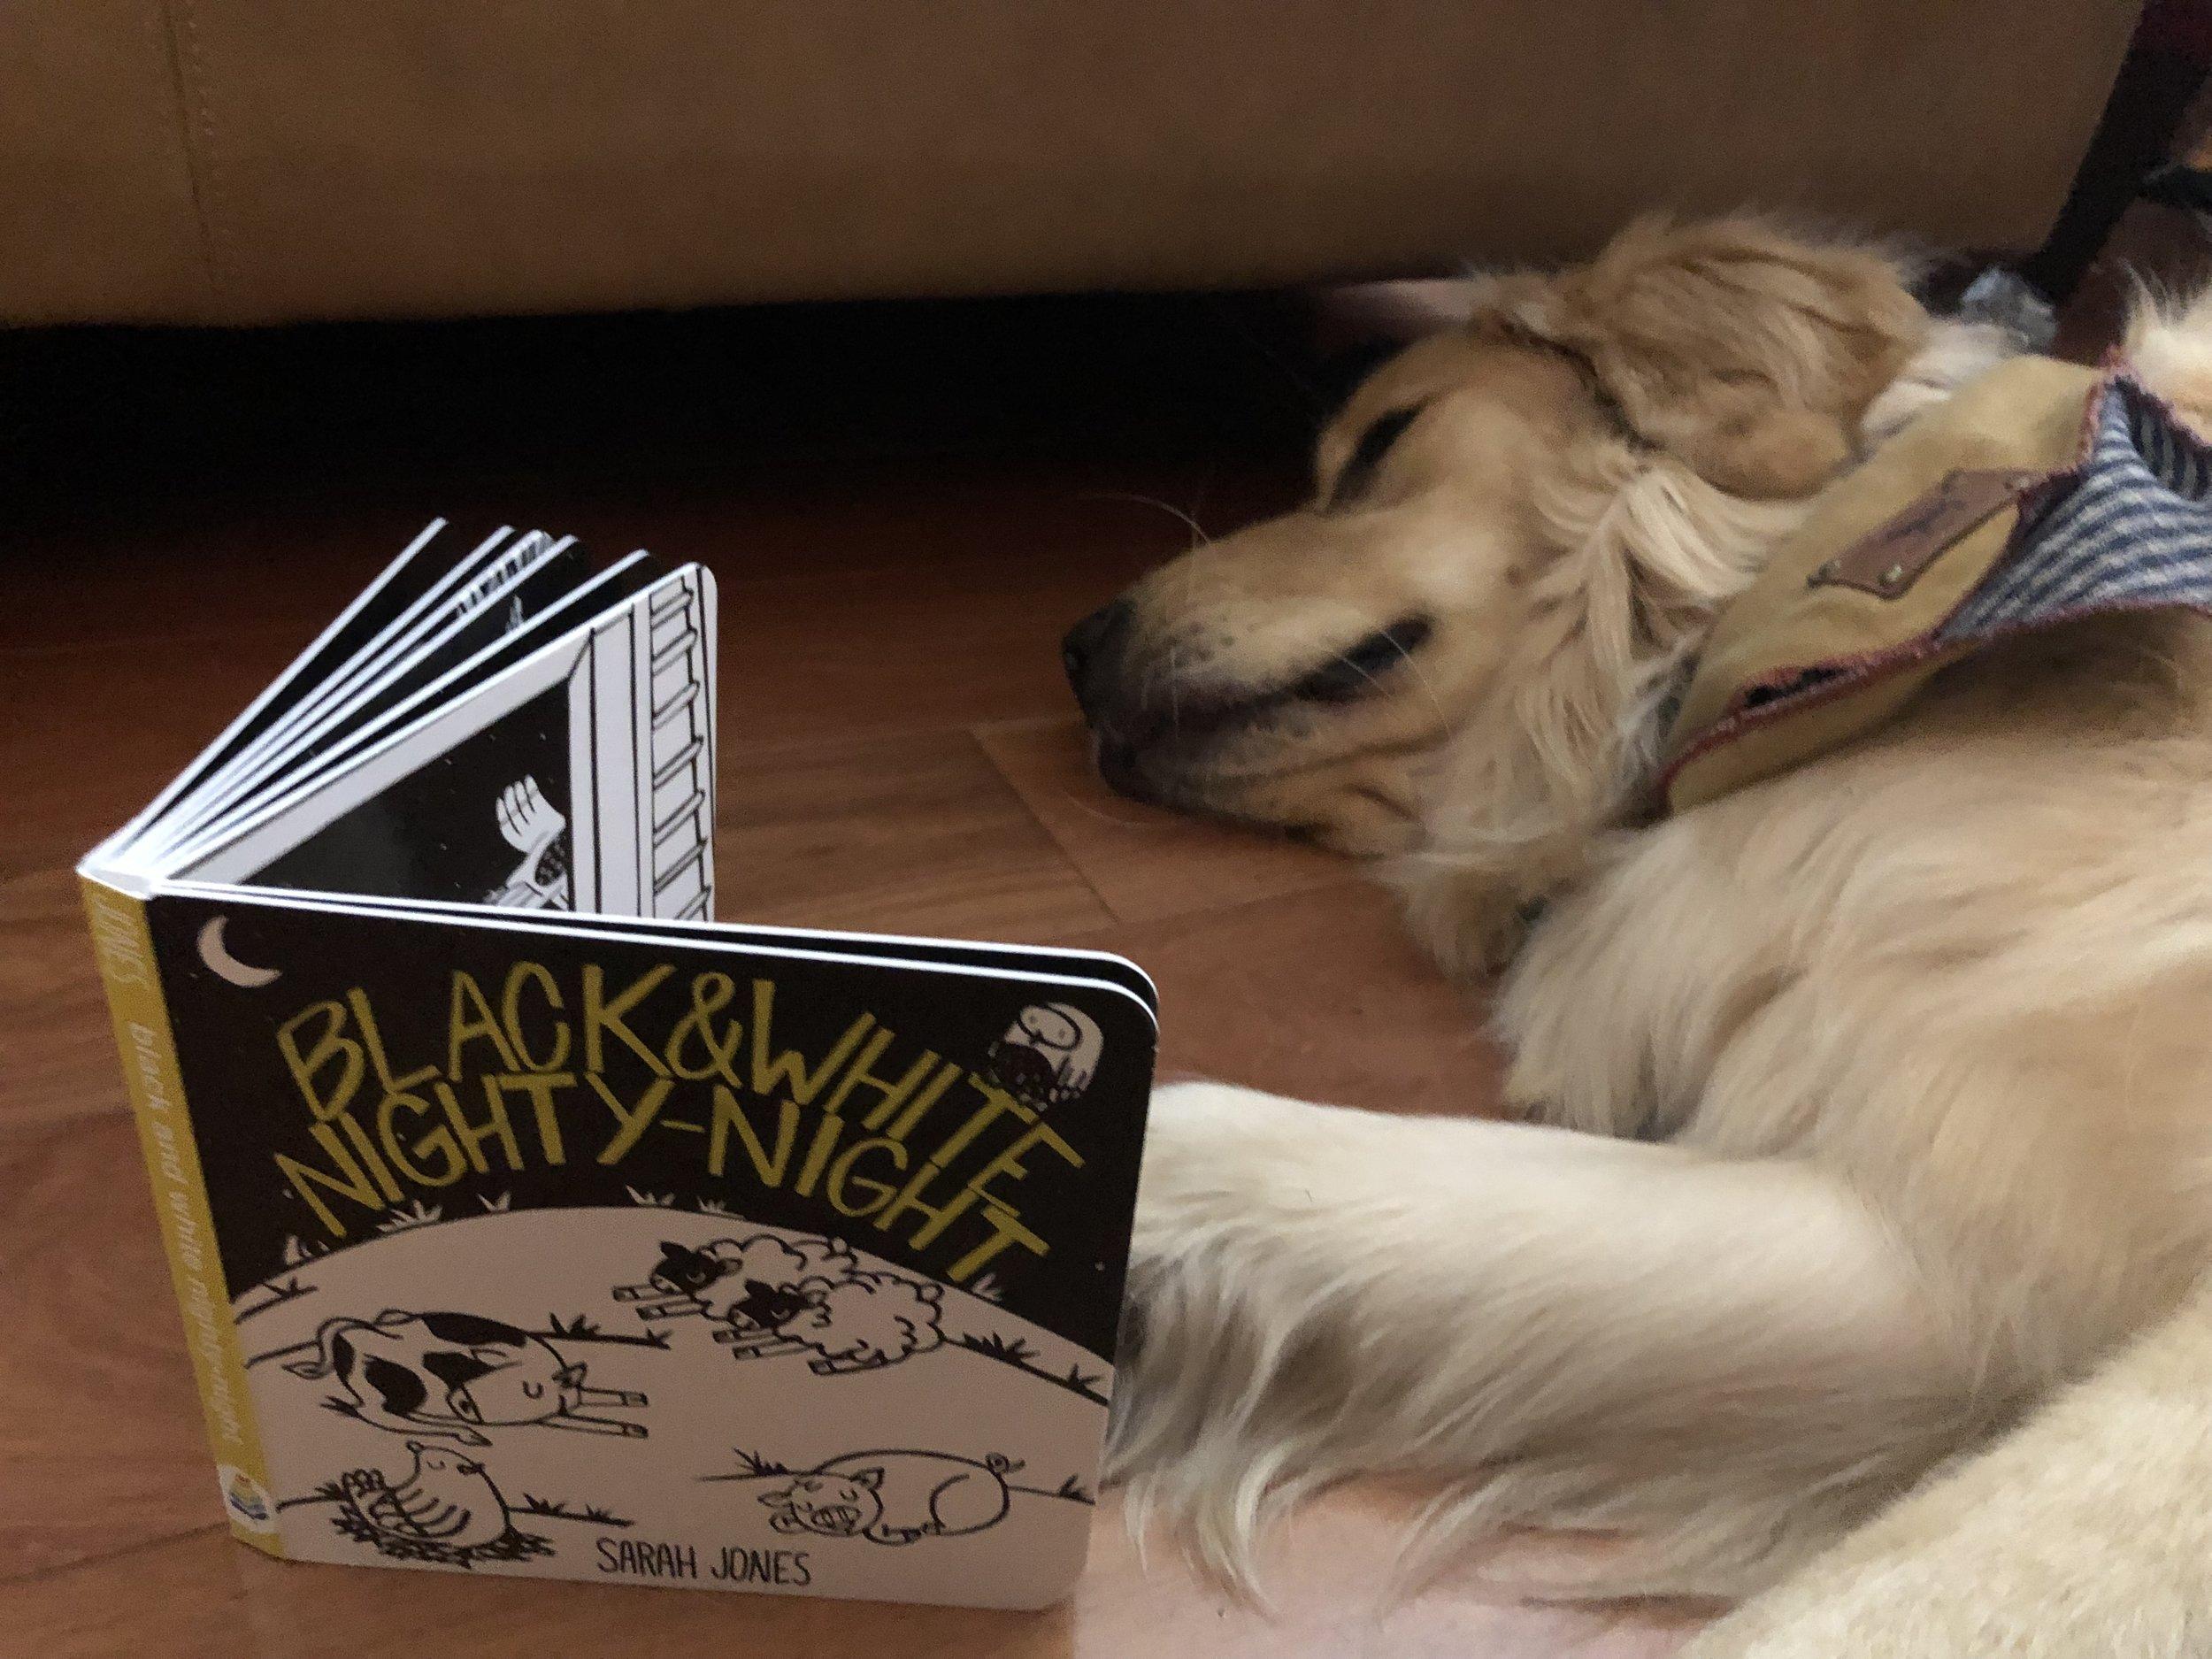 blue manatee press_black and white nighty night_board book_dog(2).JPEG